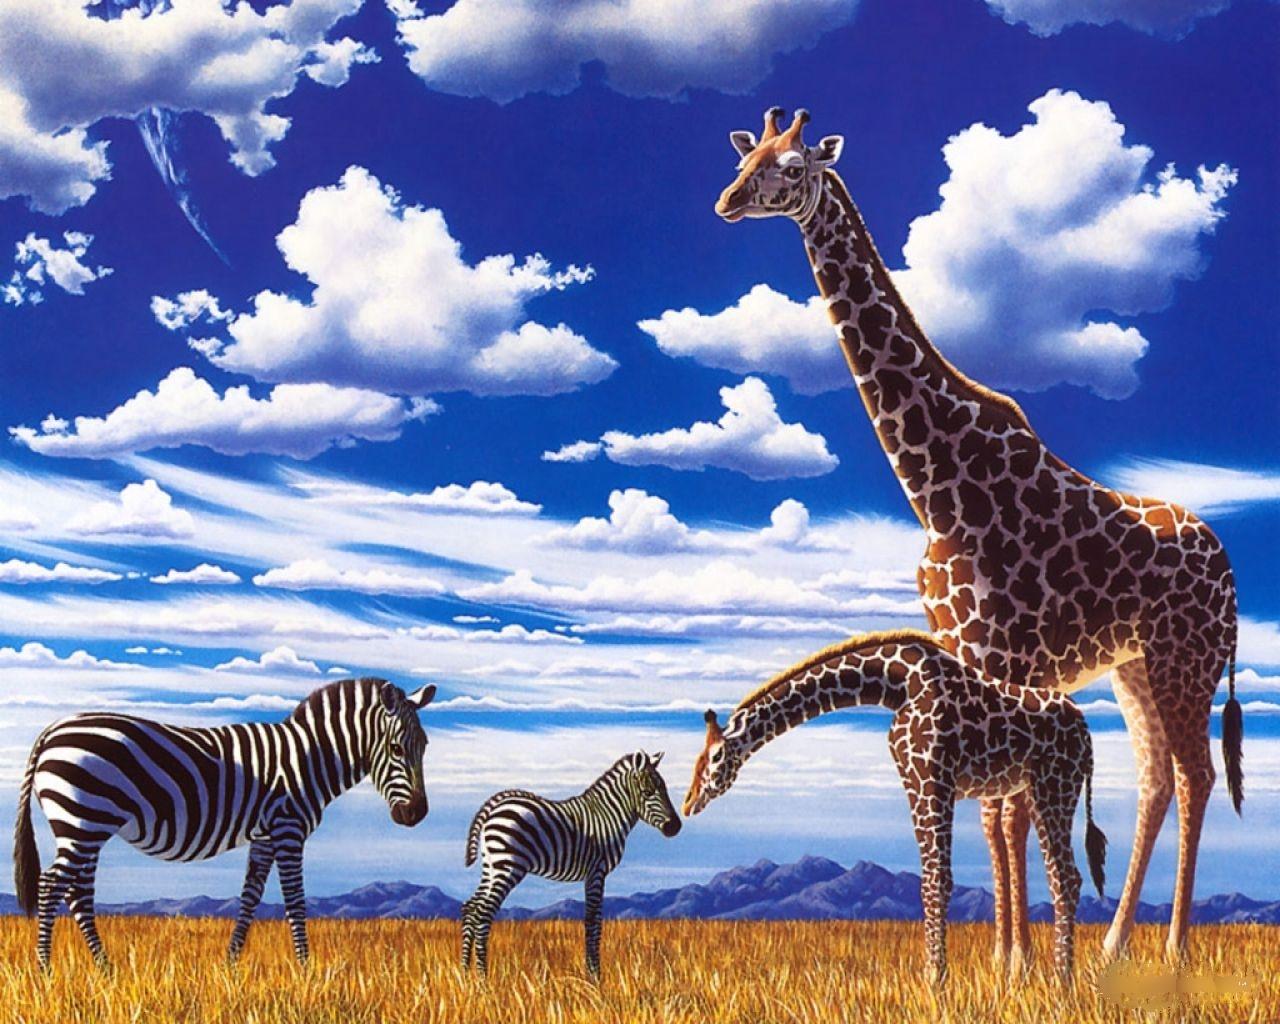 Zebra And Giraffes Wallpapers